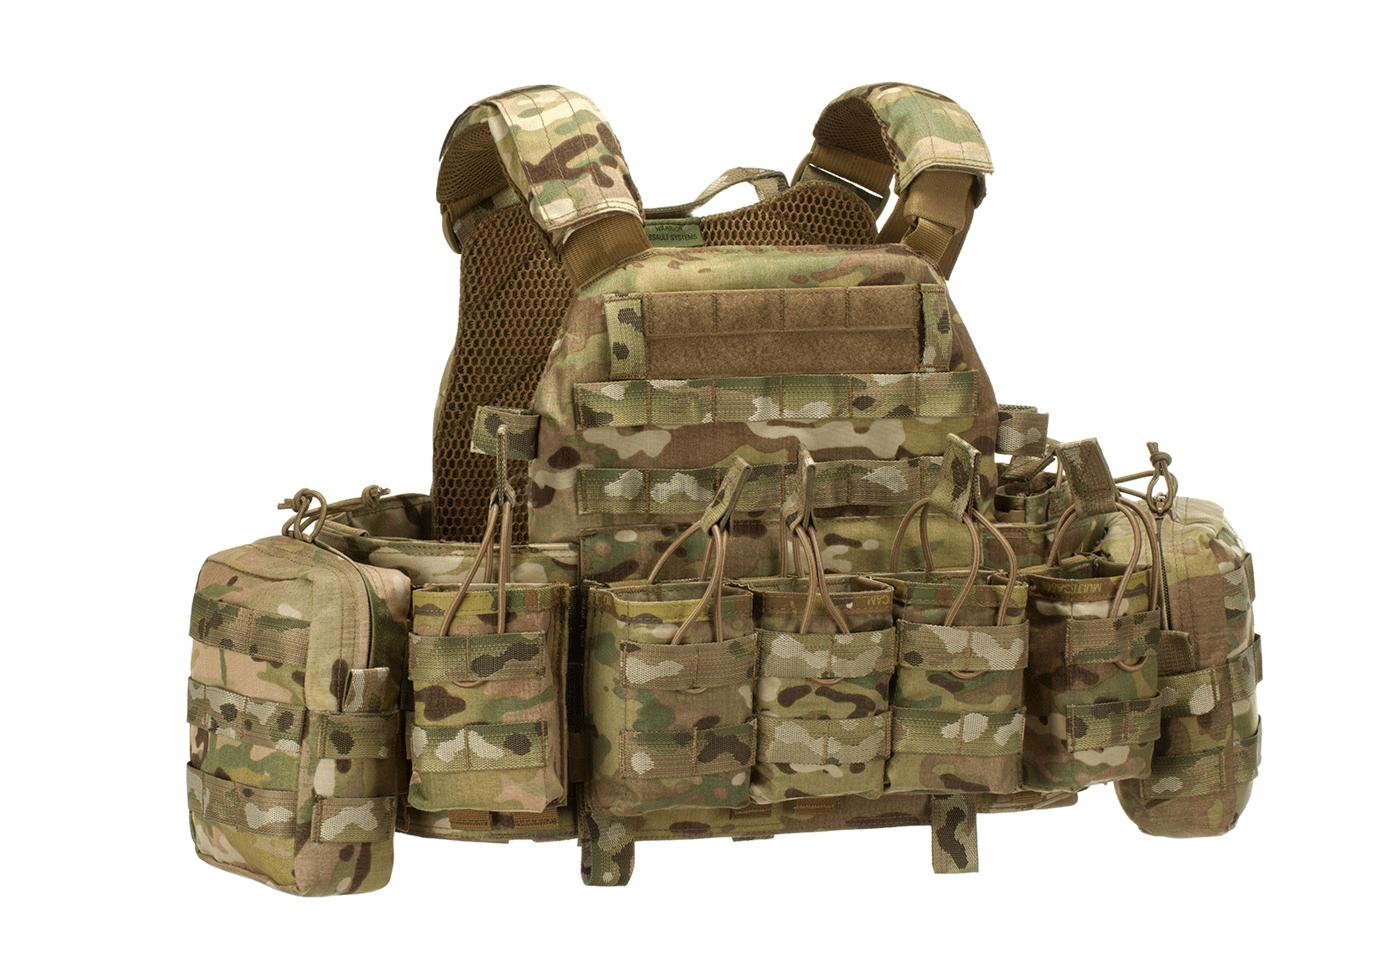 dcs g36 config multicam warrior l plate carriers gilets load